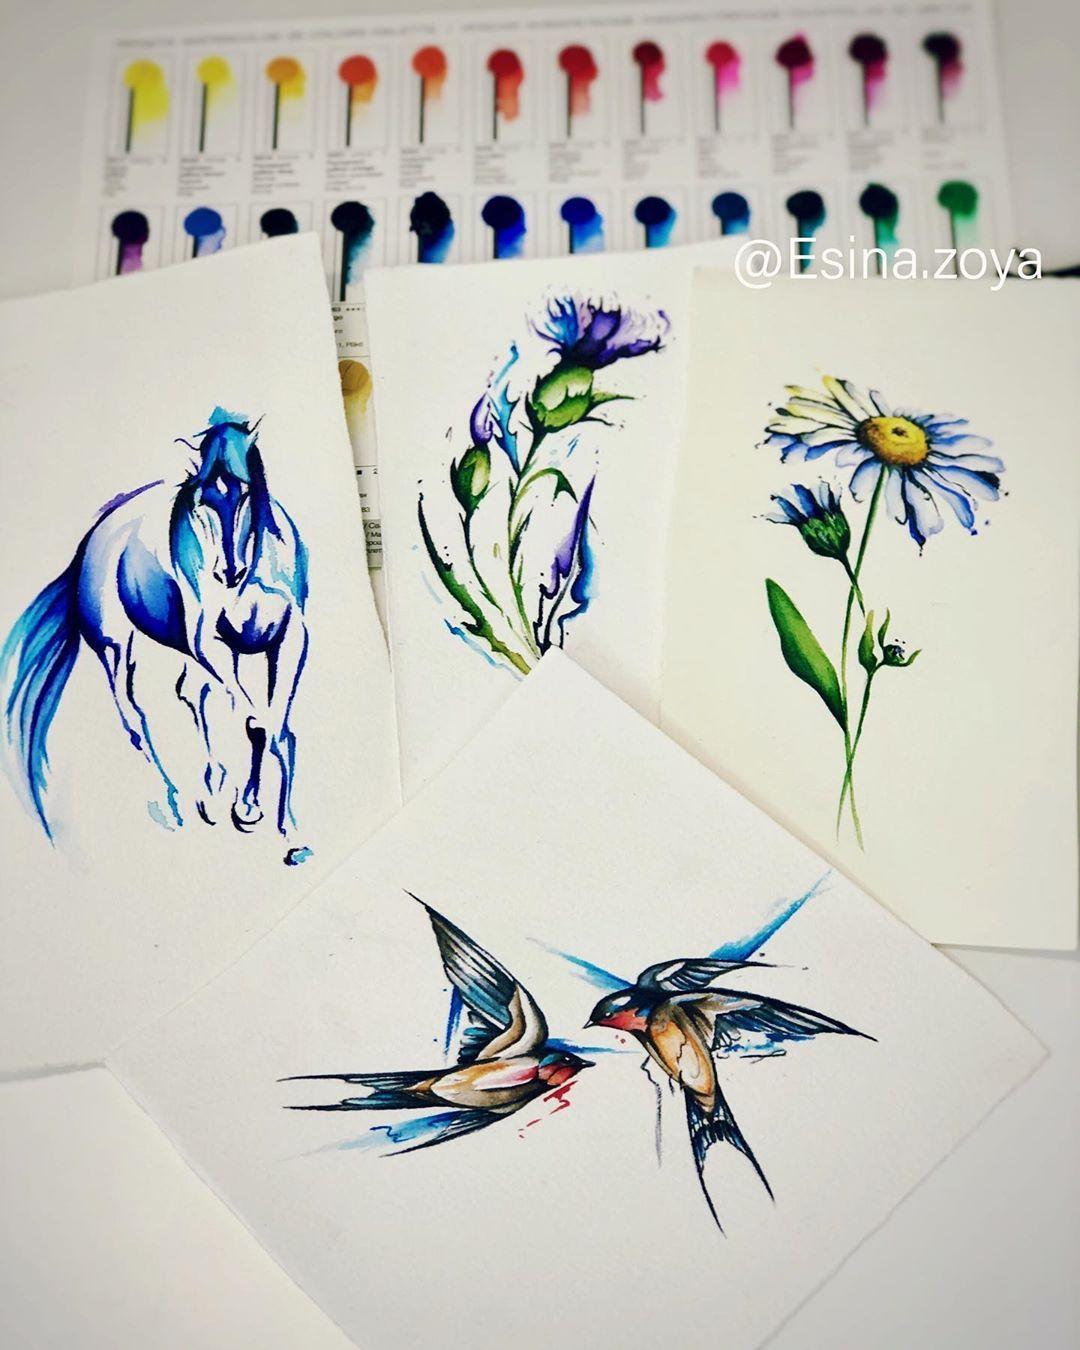 Свободные дизайны. По всем вопросам пишите в direct📩. #waterolortattoo #watercolorpainting #tattoosketch #watercolorflower #spbtattoo #татупитер #татуспб #colortattoo #tattooart